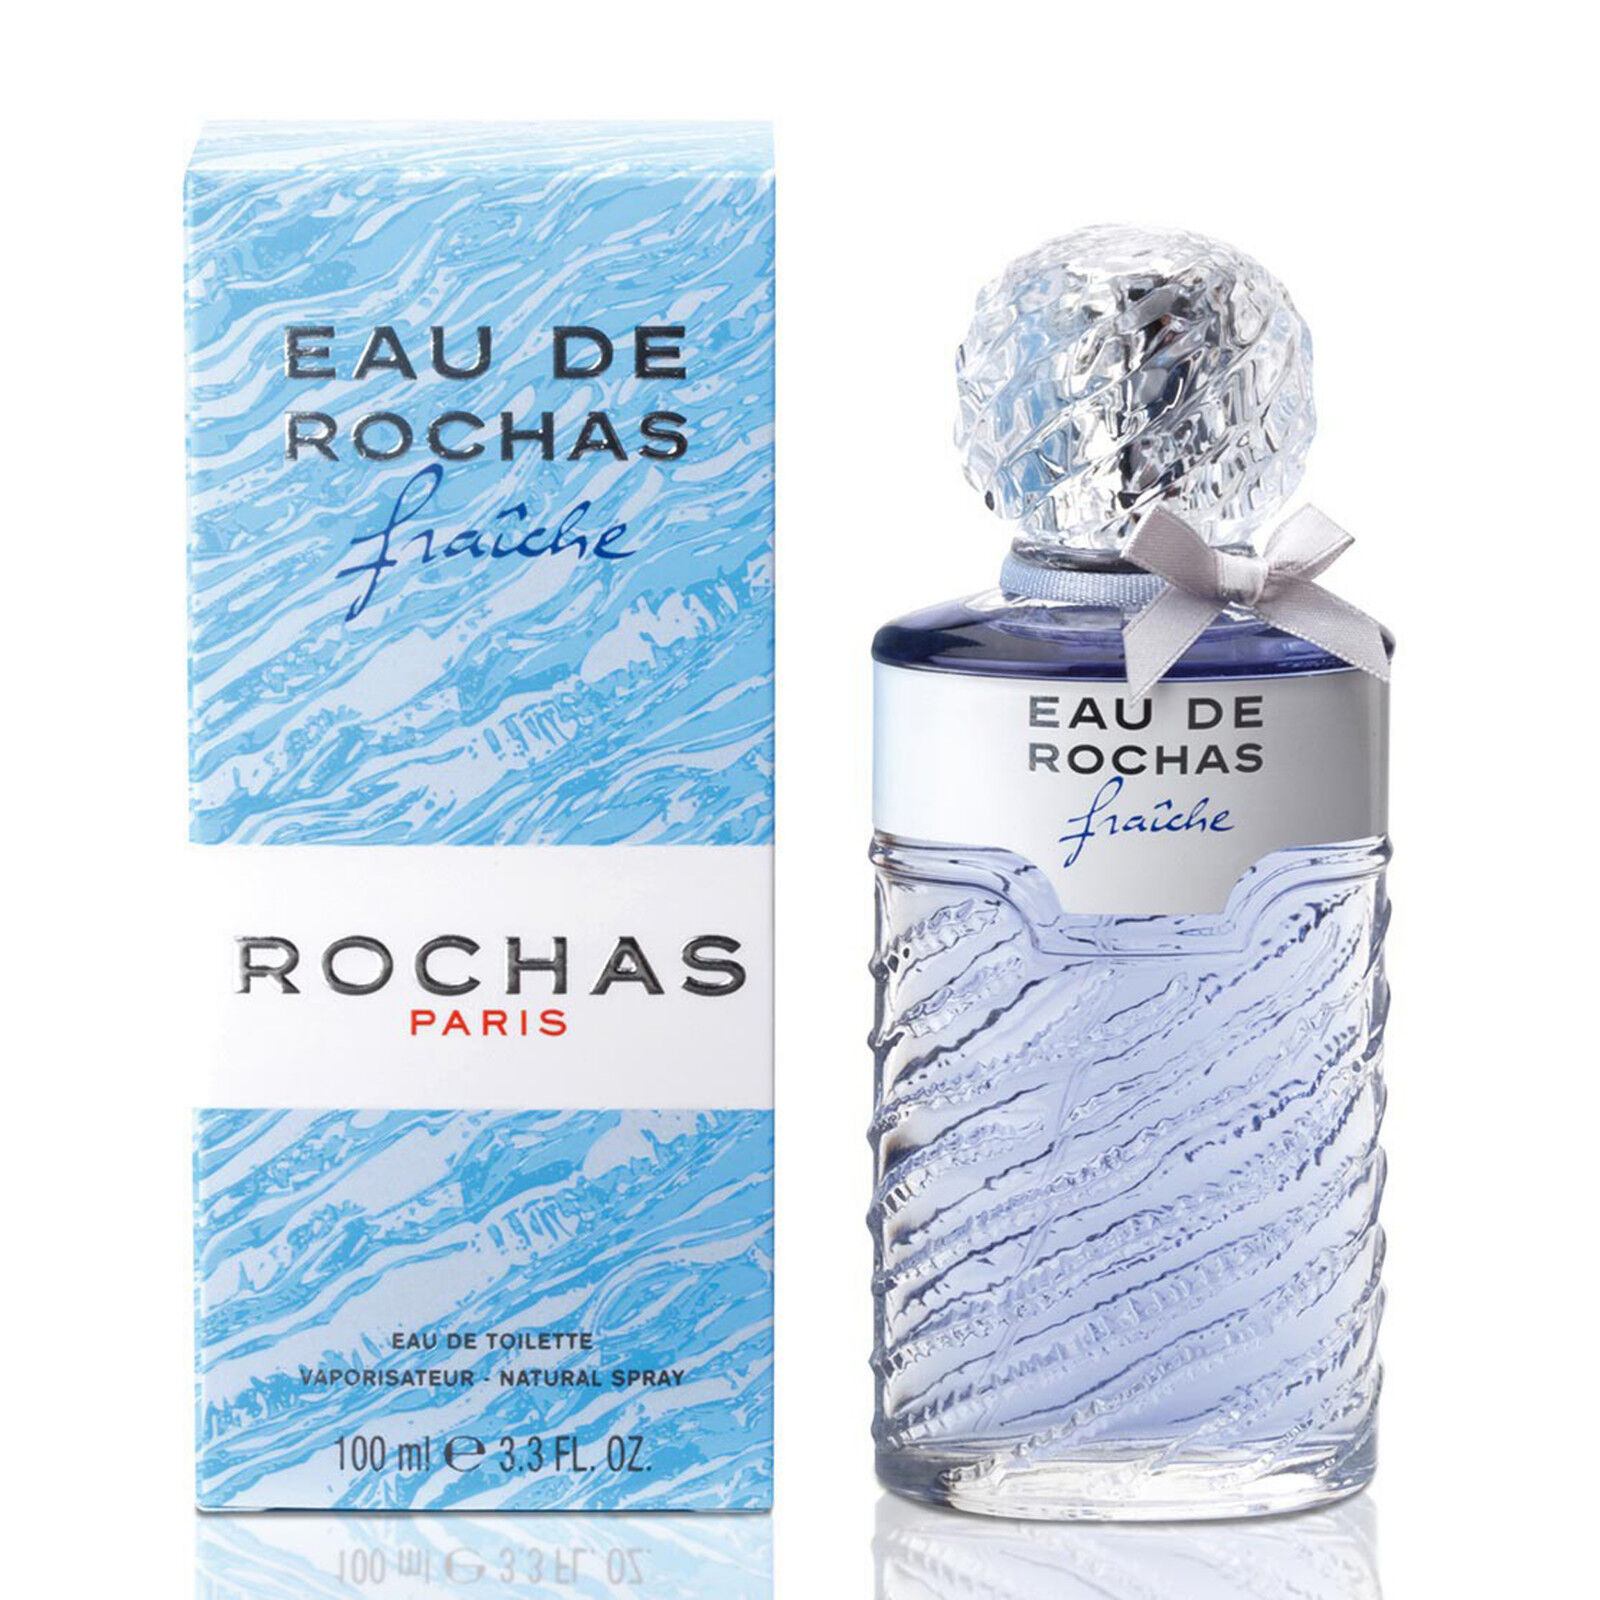 Detalles de EAU DE ROCHAS FRAICHE de ROCHAS Colonia Perfume EDT 100 mL Woman Fraîche